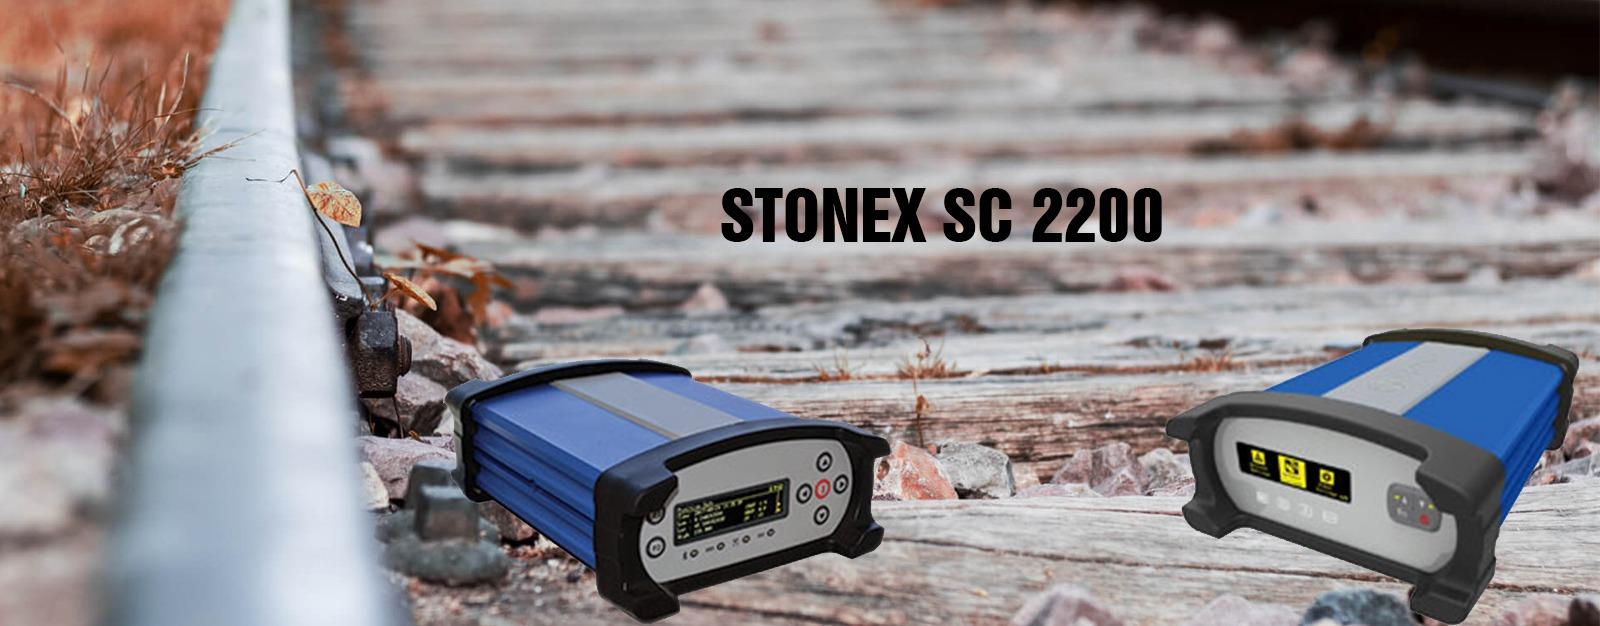 sc-2200